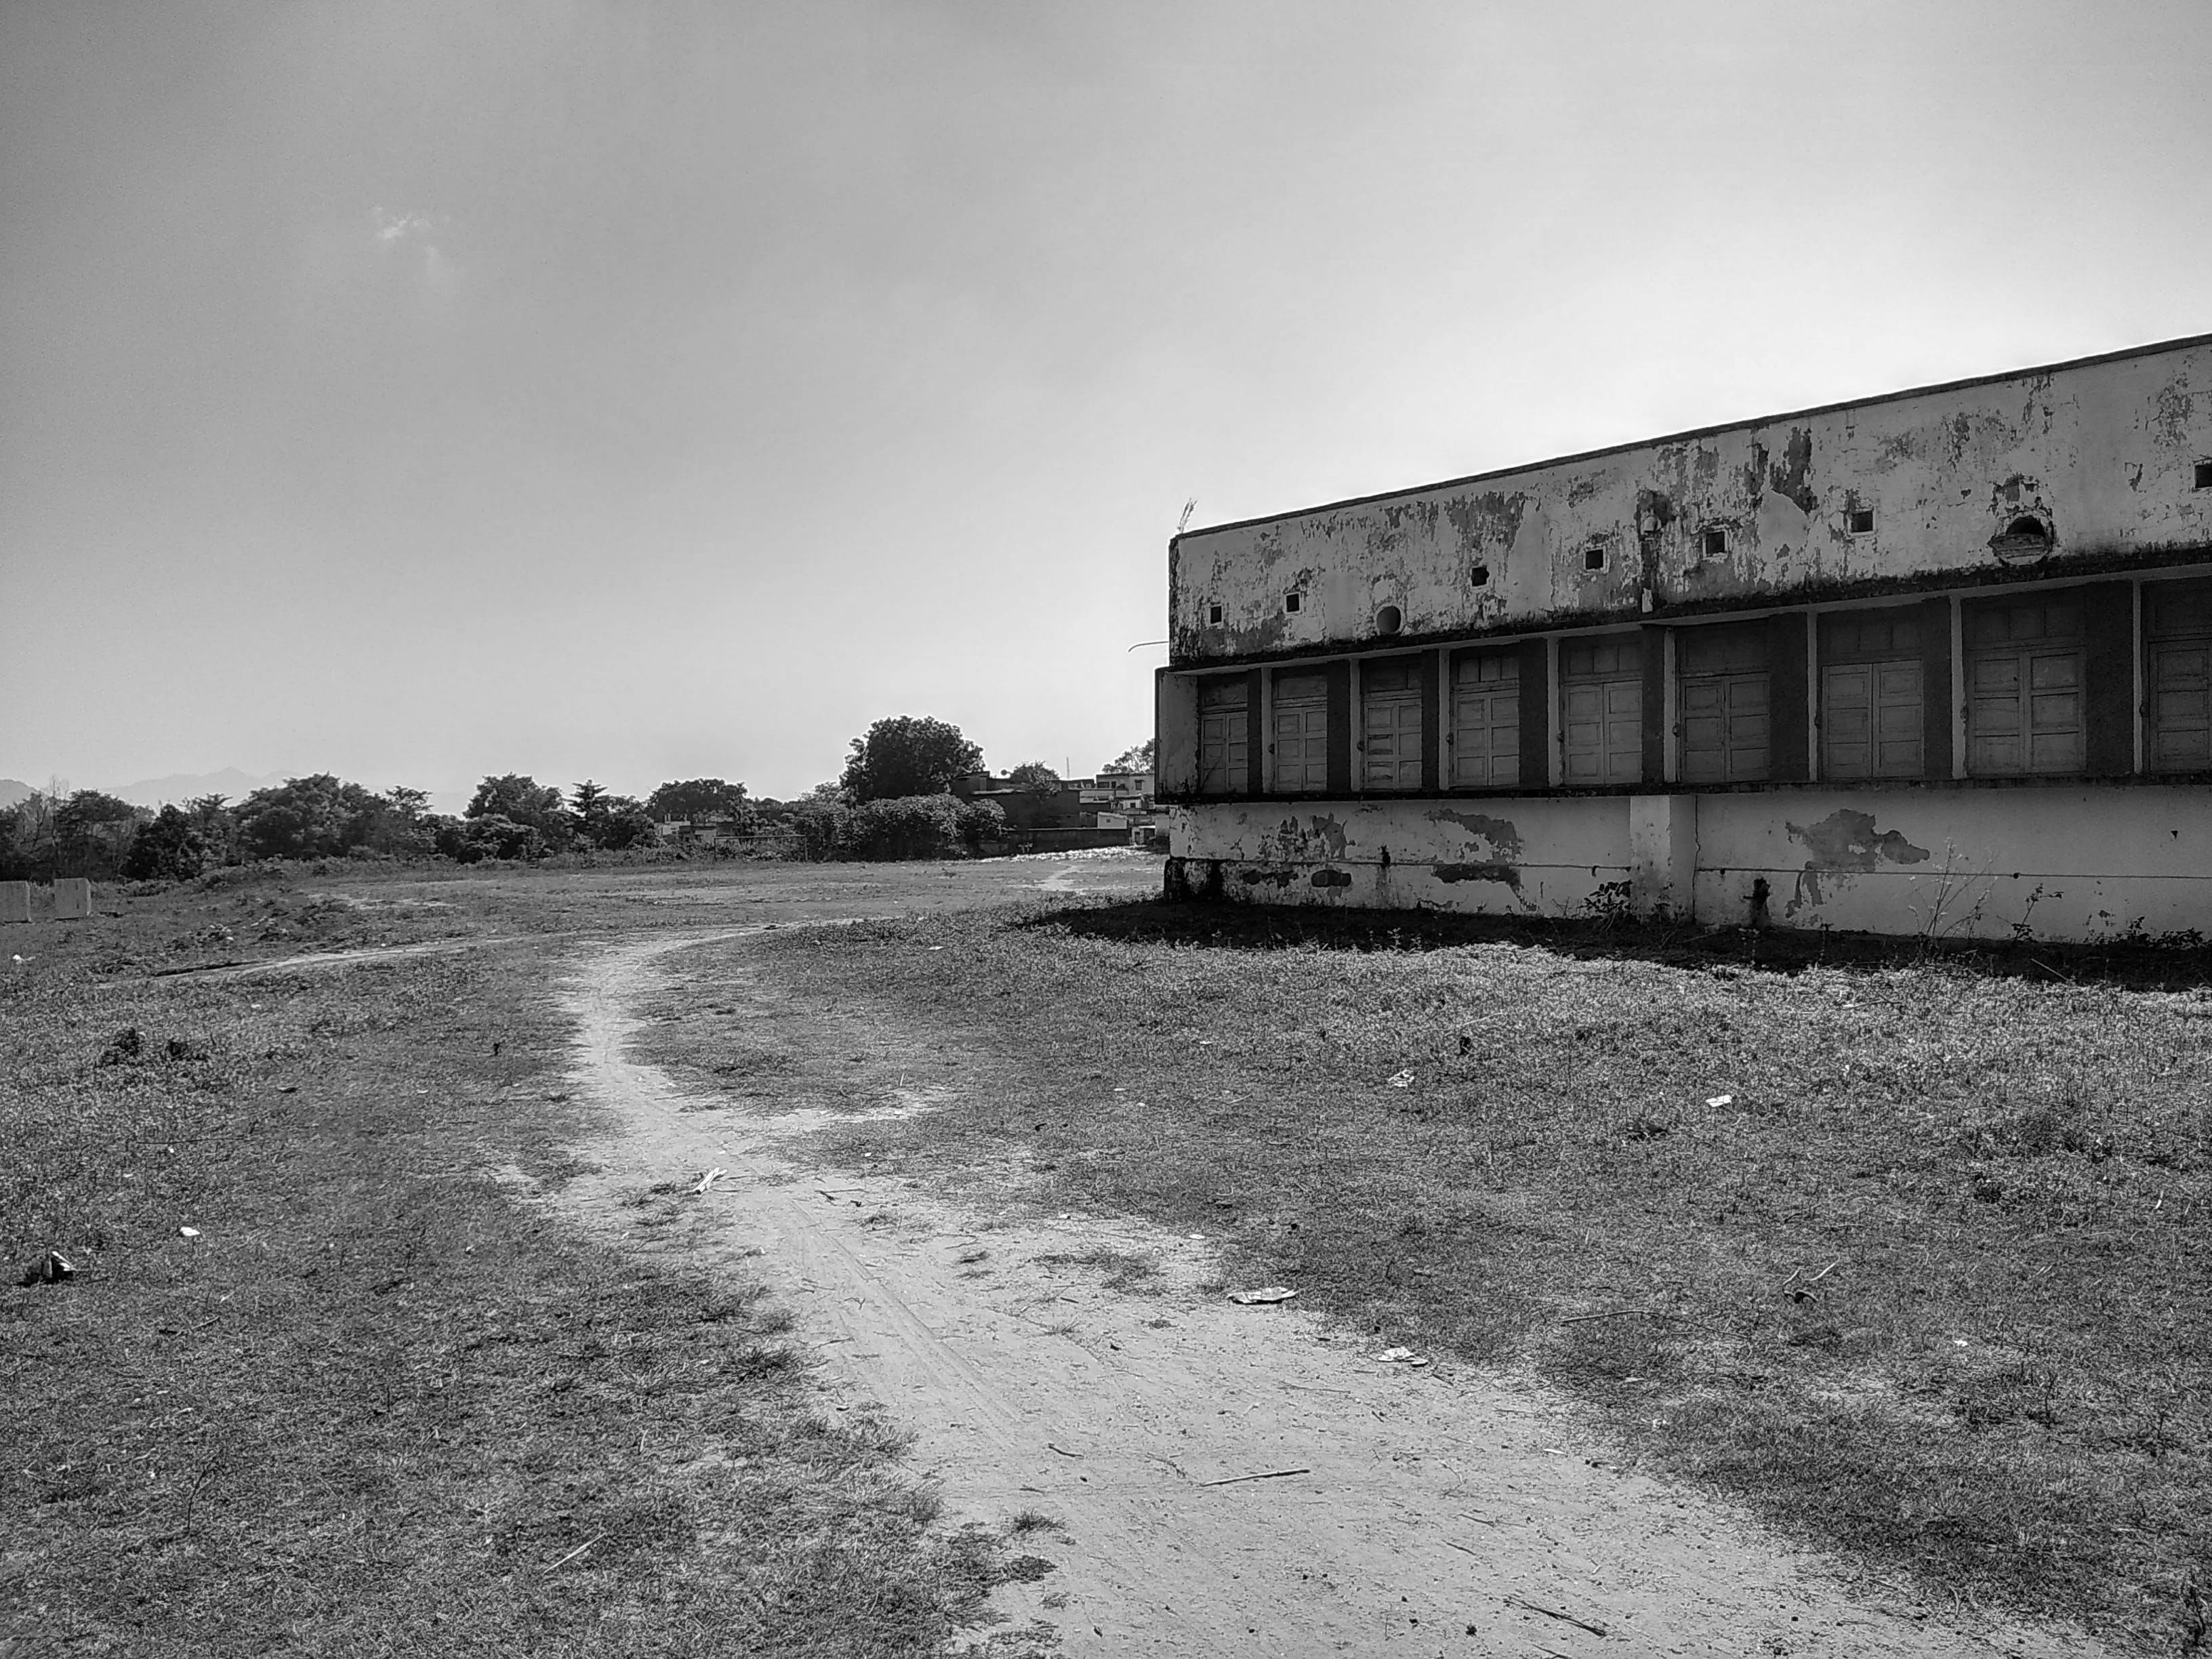 Vintage Photograph of Building